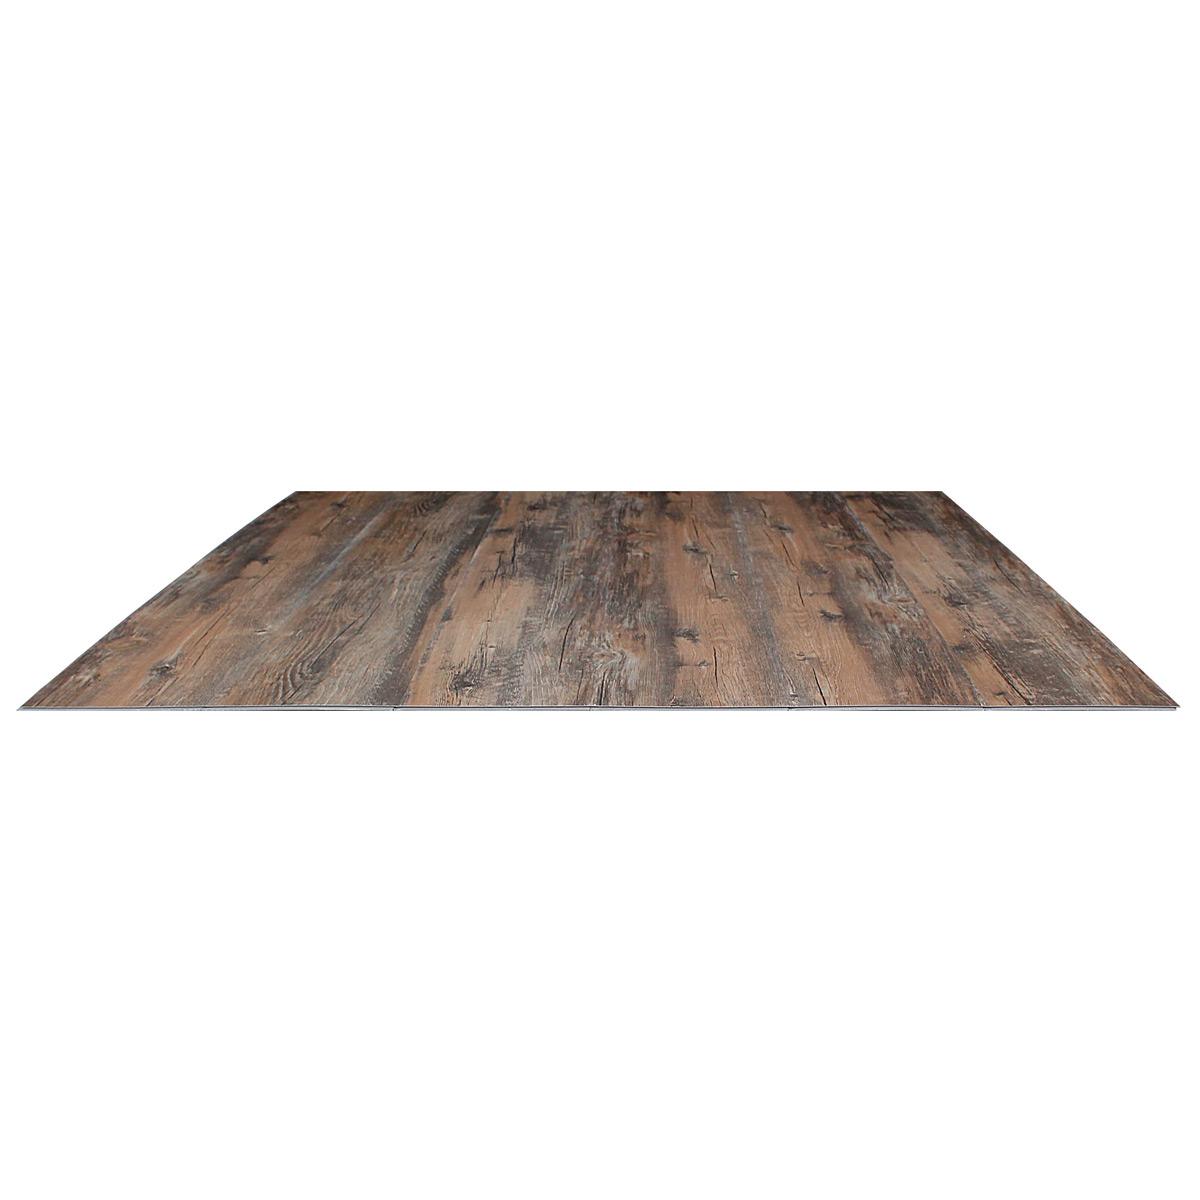 New oak m vinyl laminate click old floor